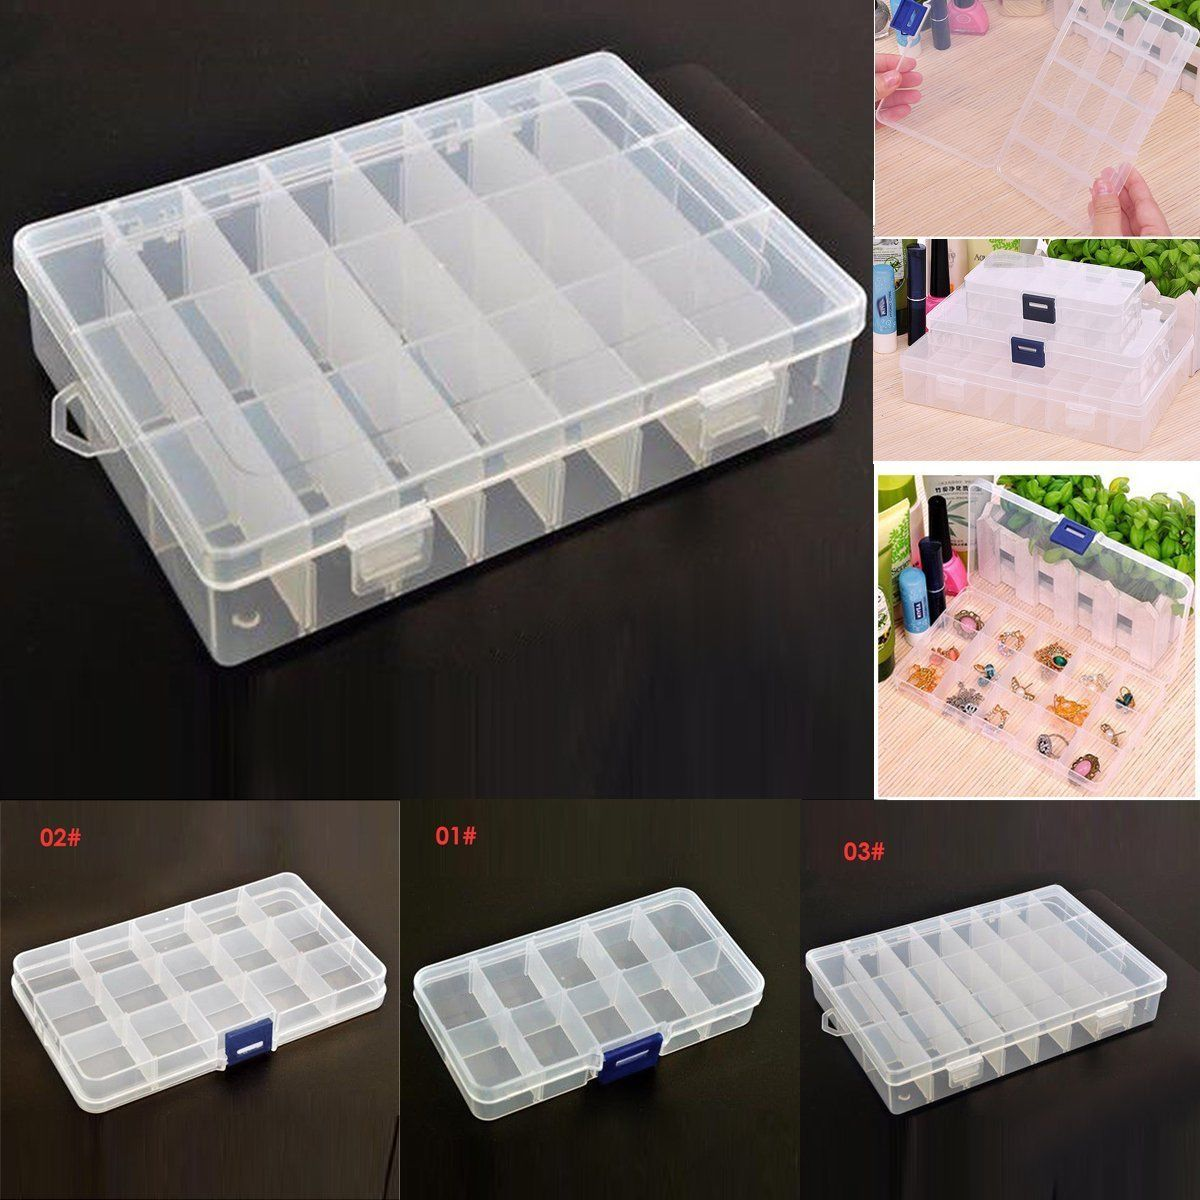 Portable Detachable Jewelry Ring Display Organizer Box Tray Holder Storage Case Plastic Box Storage Jewellery Storage